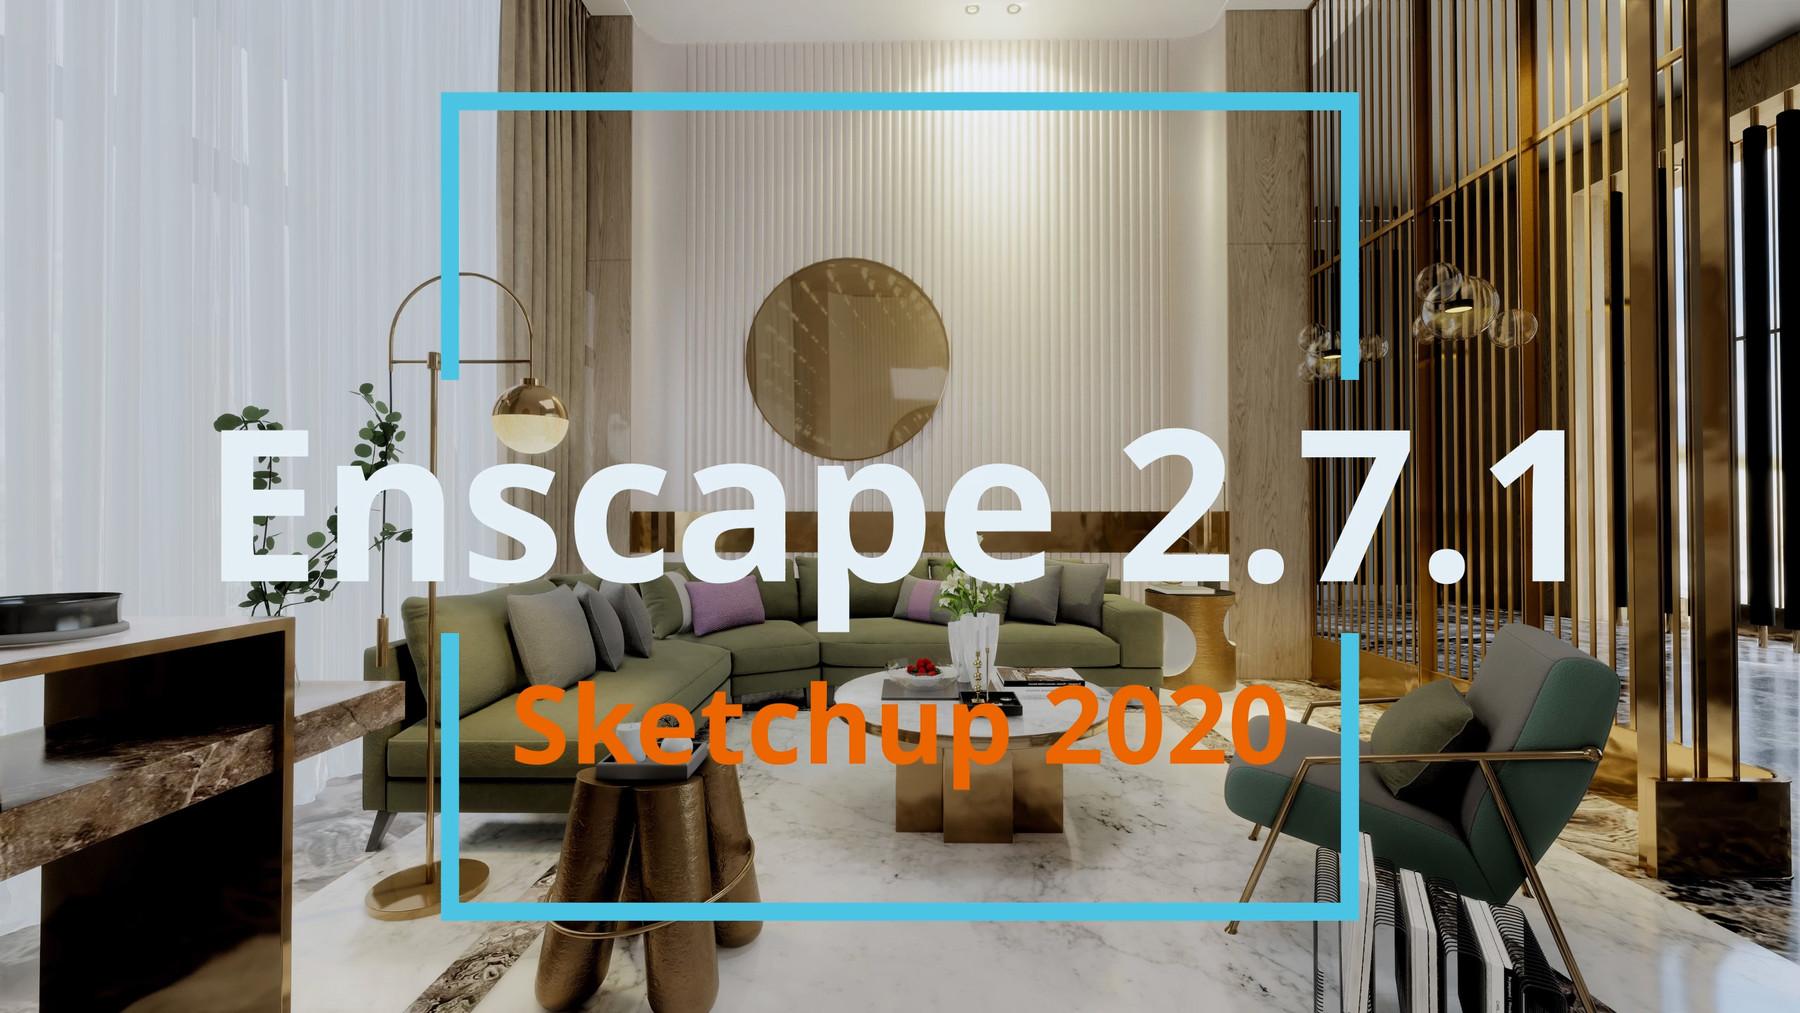 free download sofa area enscape 2 7 1 sketchup 2020